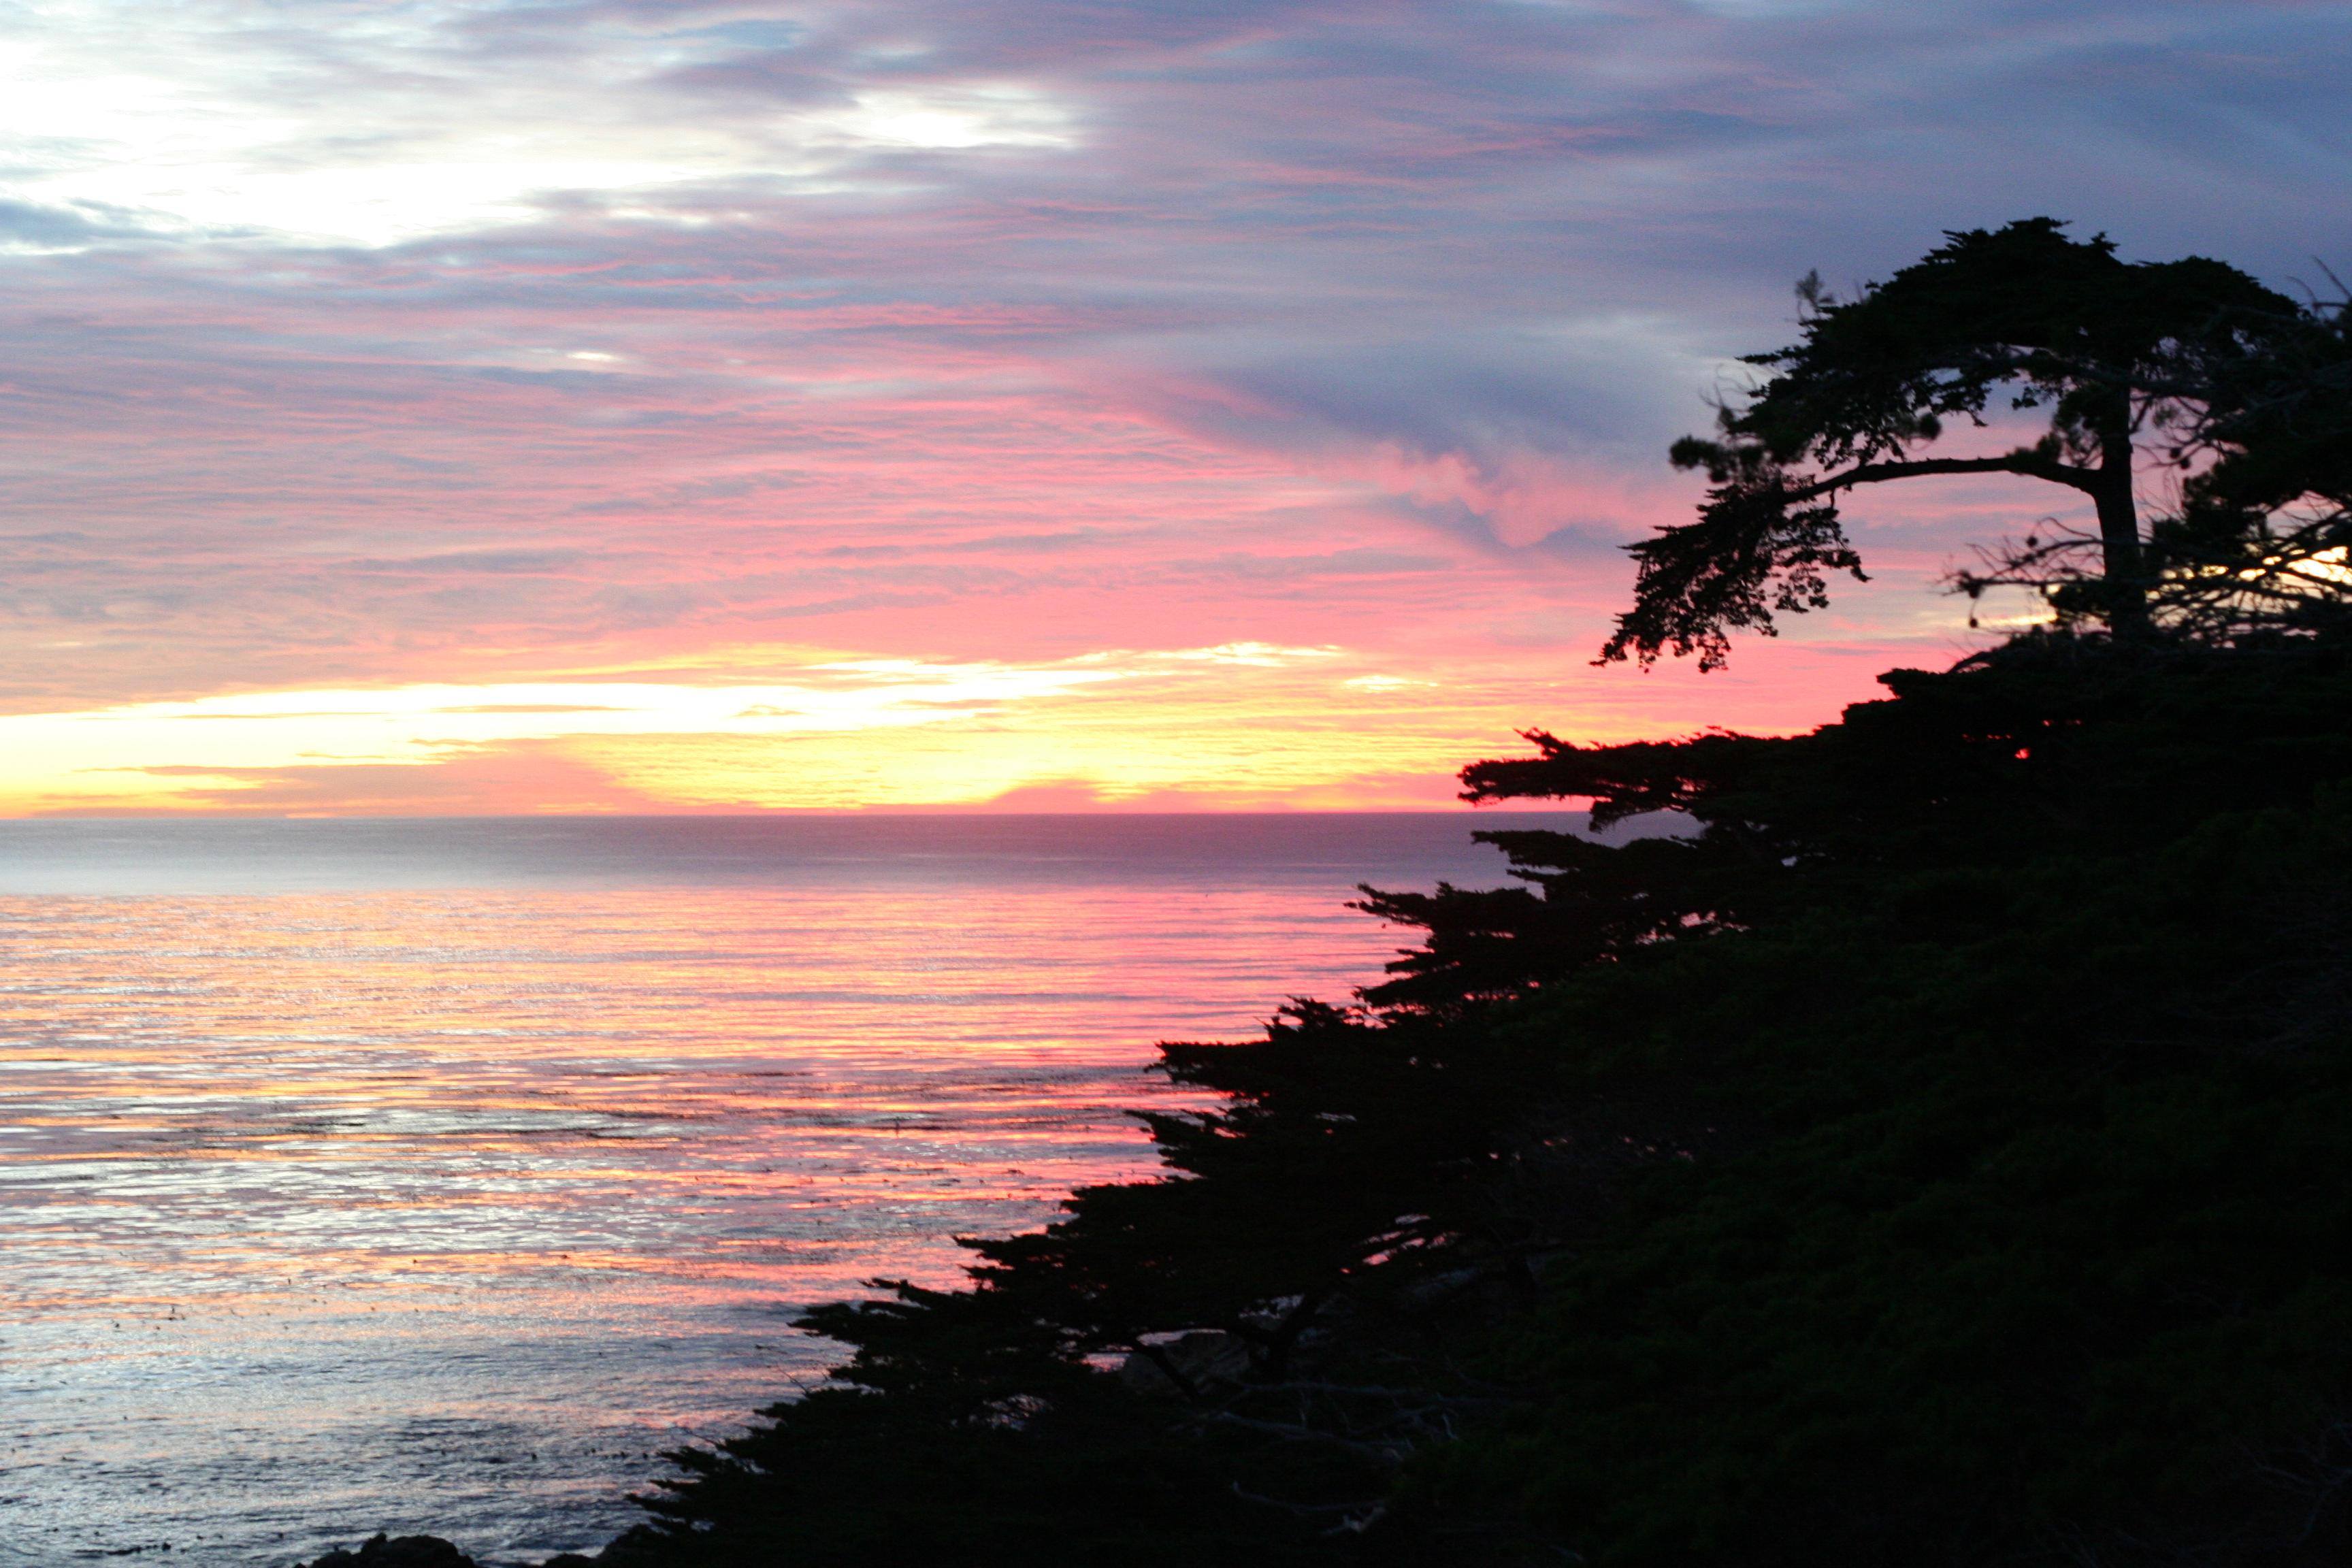 Northern california coast   Ecosia 3456x2304